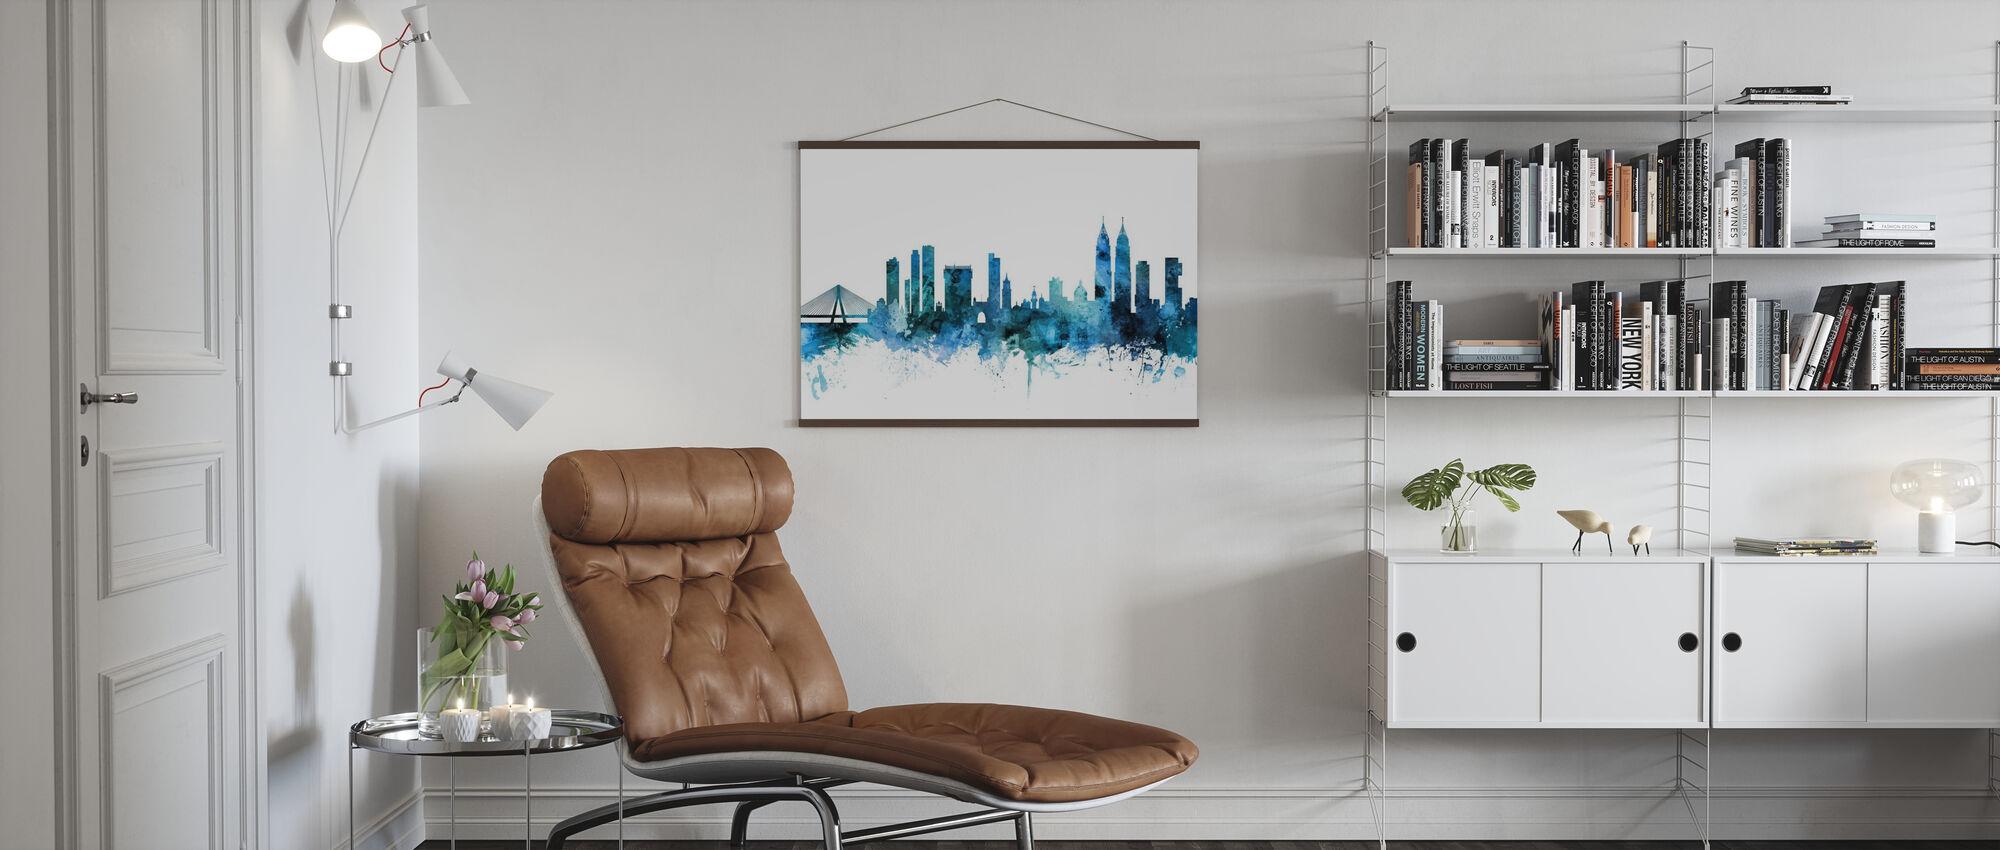 Mumbai Skyline India Bombay - Poster - Living Room